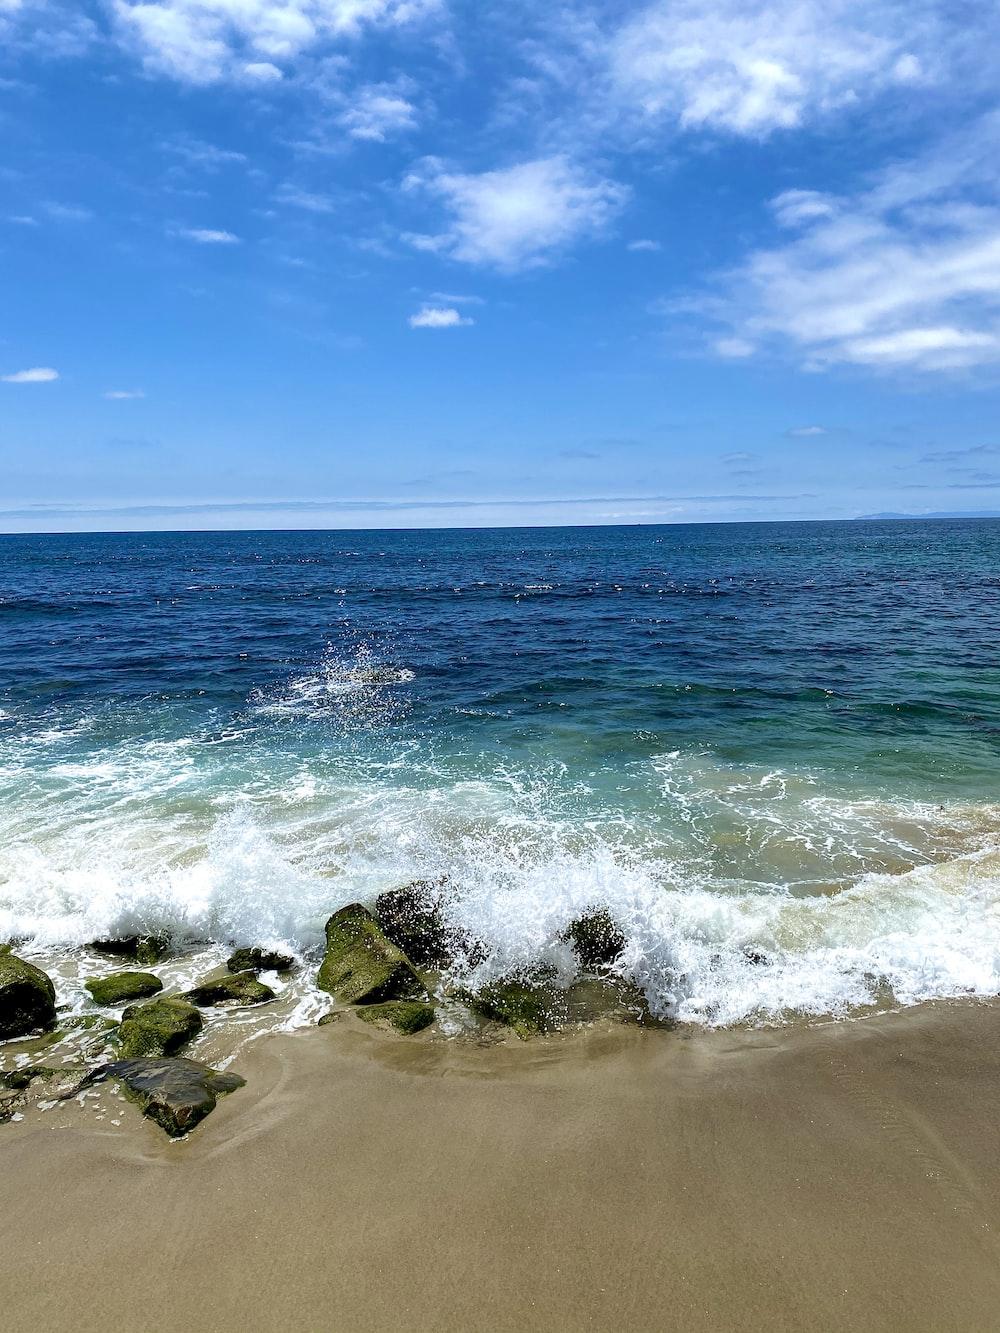 sea waves crashing on rocks under blue sky during daytime